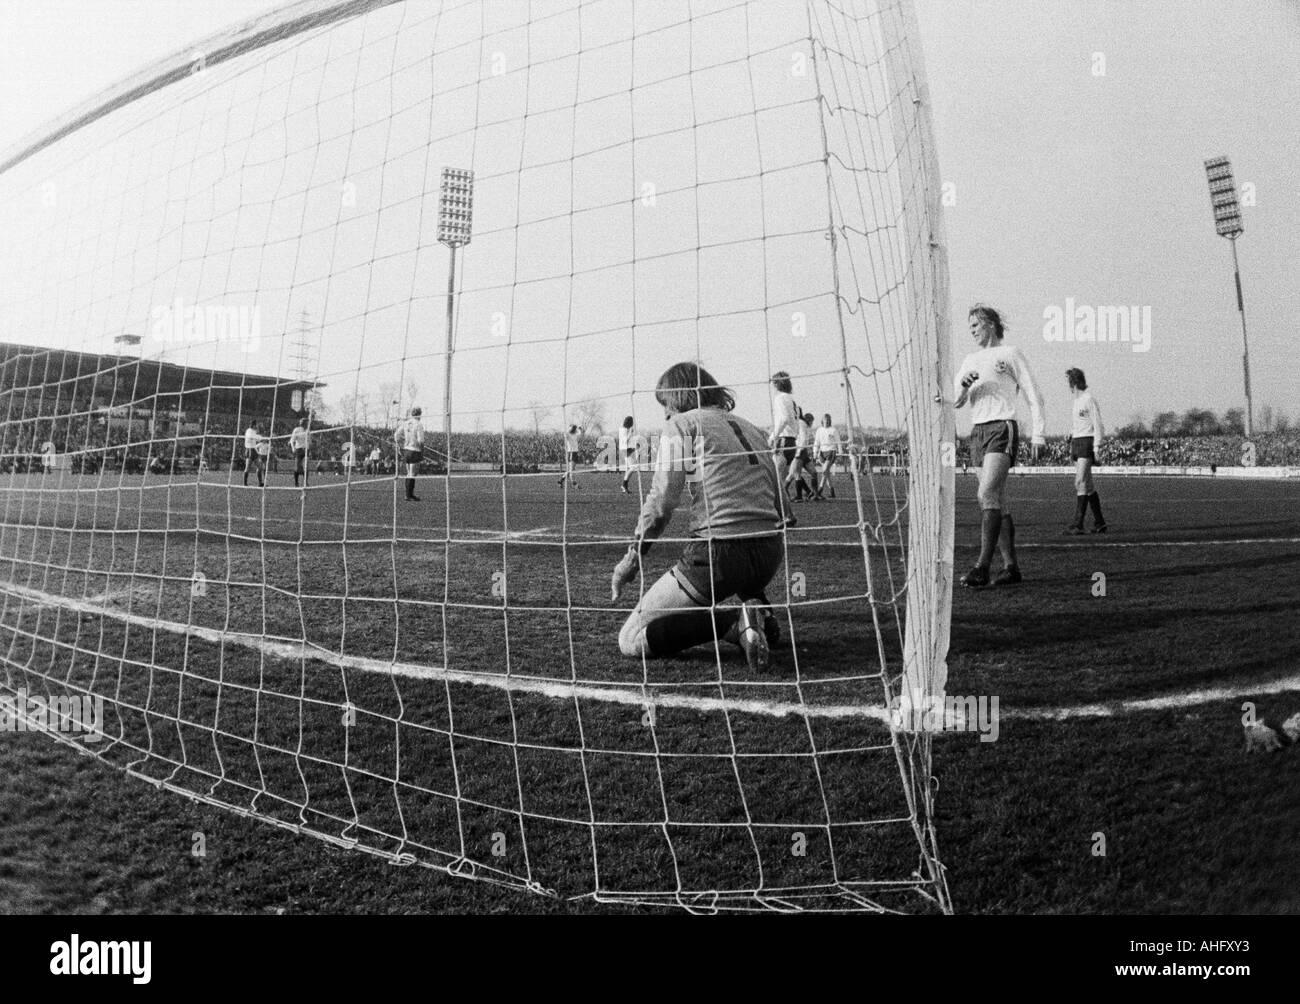 football, Bundesliga, 1972/1973, Rot-Weiss Oberhausen versus Borussia Moenchengladbach 1:3, Niederrhein Stadium in Oberhausen, scene of the match, keeper Wolfgang Kleff (MG) crouching at his goal - Stock Image